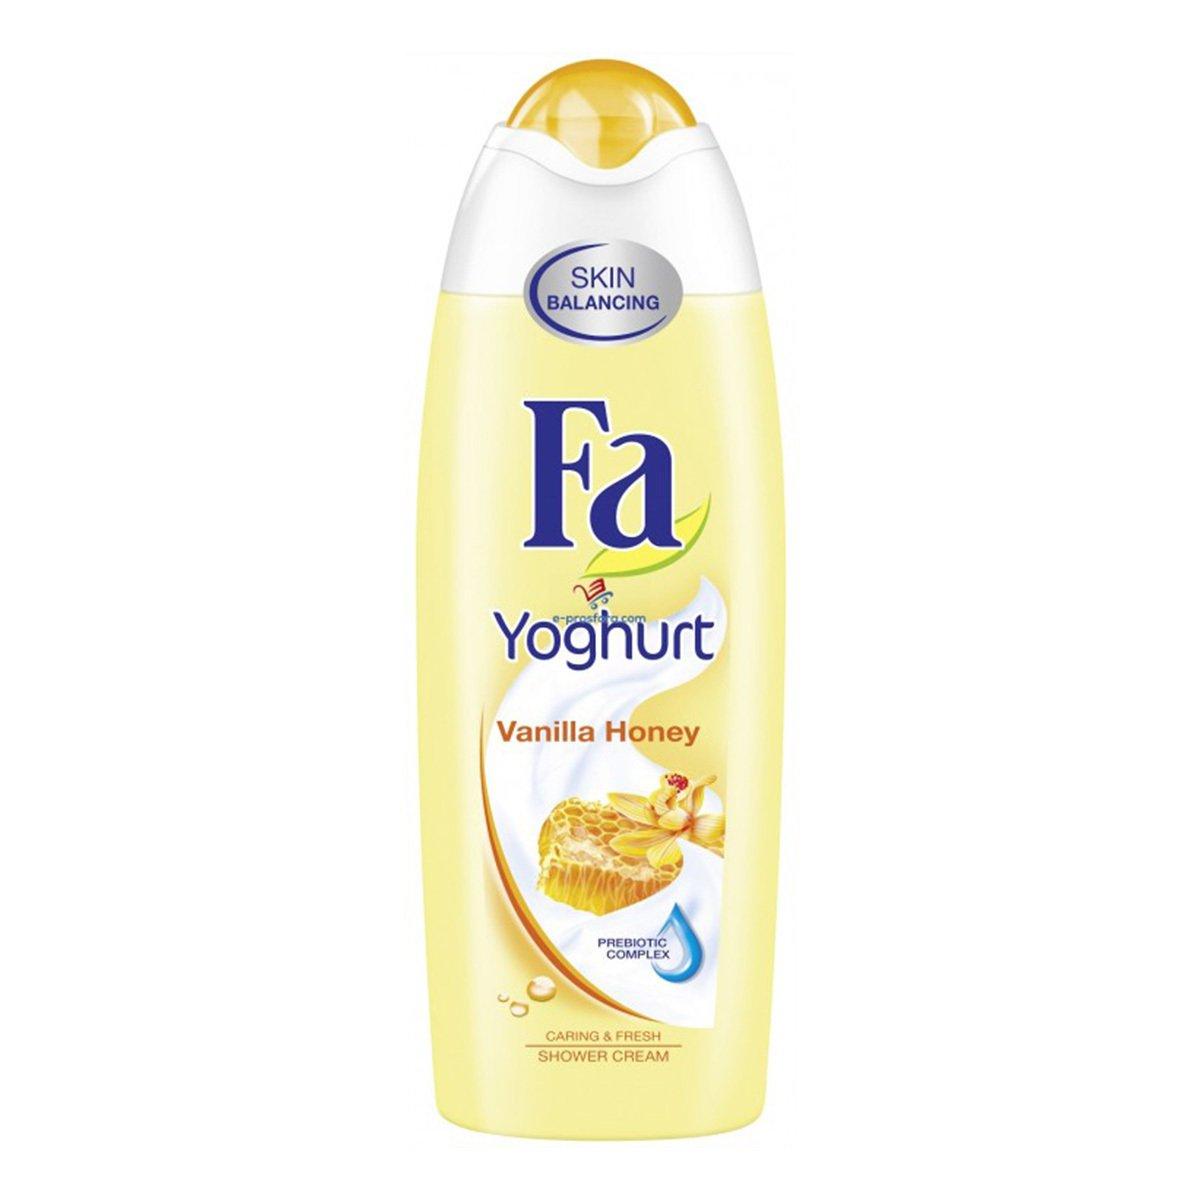 Perlier Honey Bath And Shower Cream Amazon Com Fa Cream Amp Oil Cacao Butter Amp Coco Oil Shower